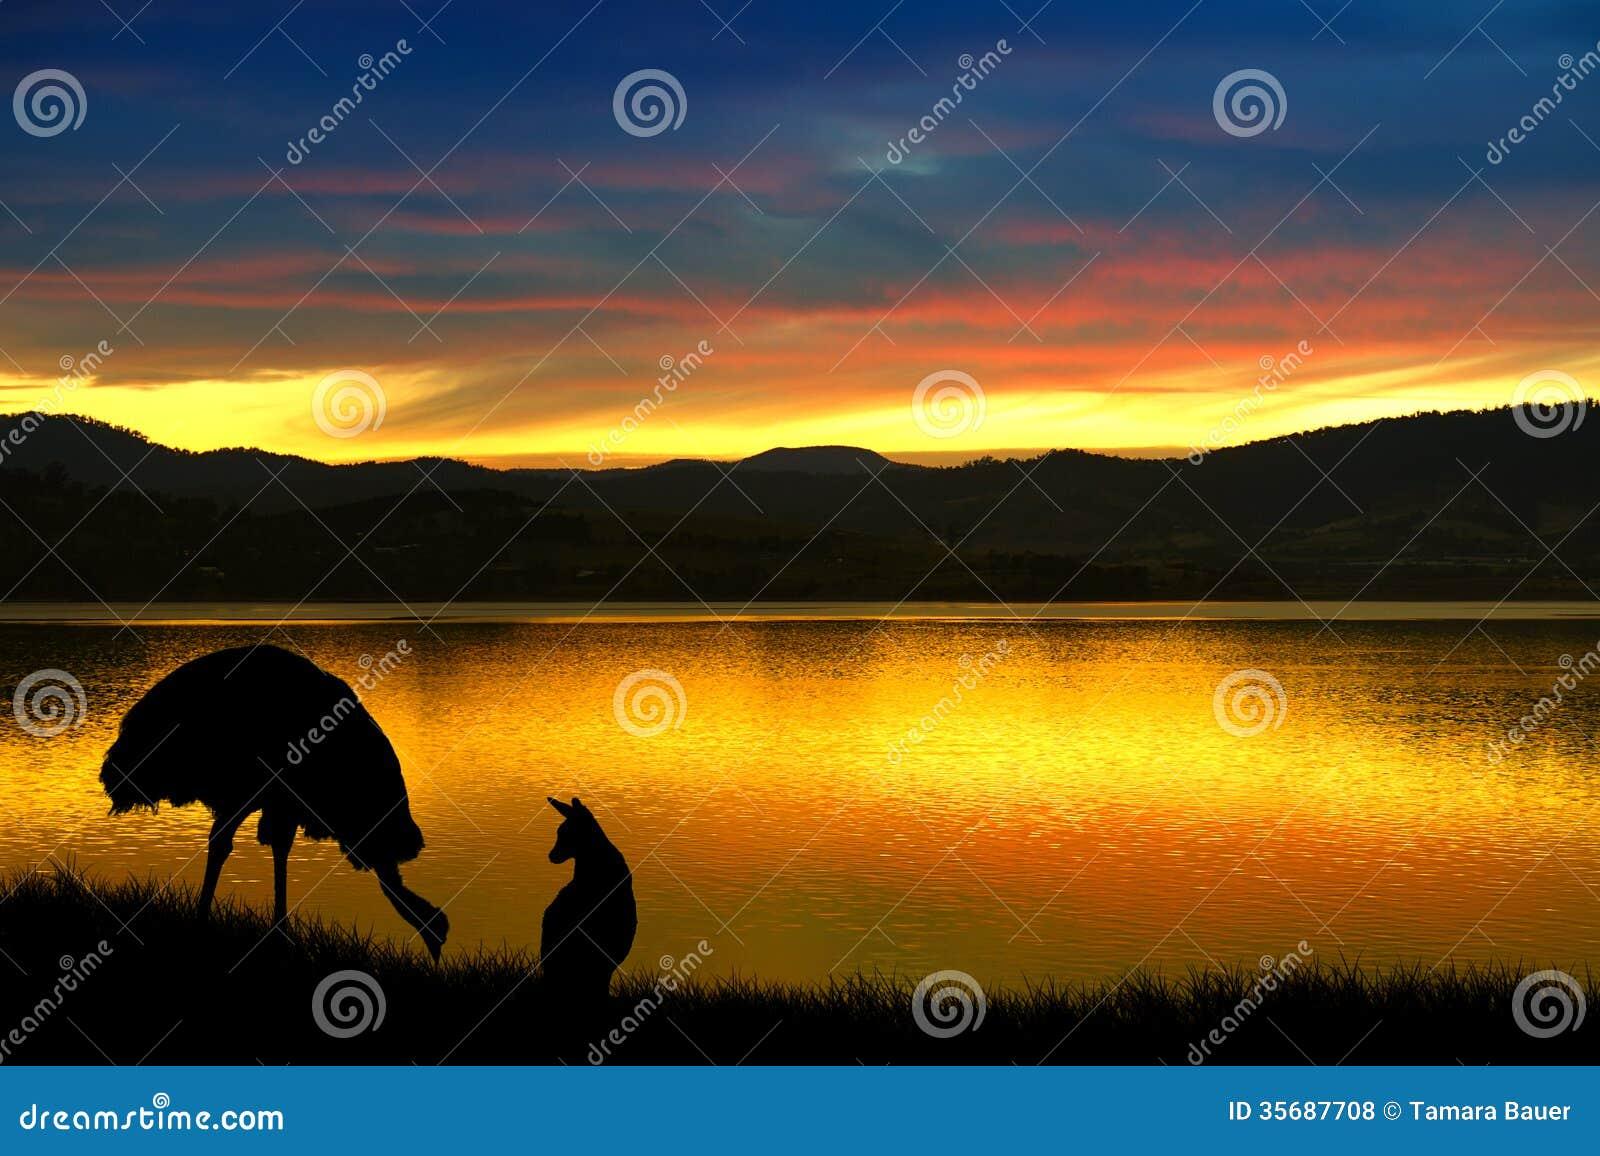 Emu and kangaroo in Australia